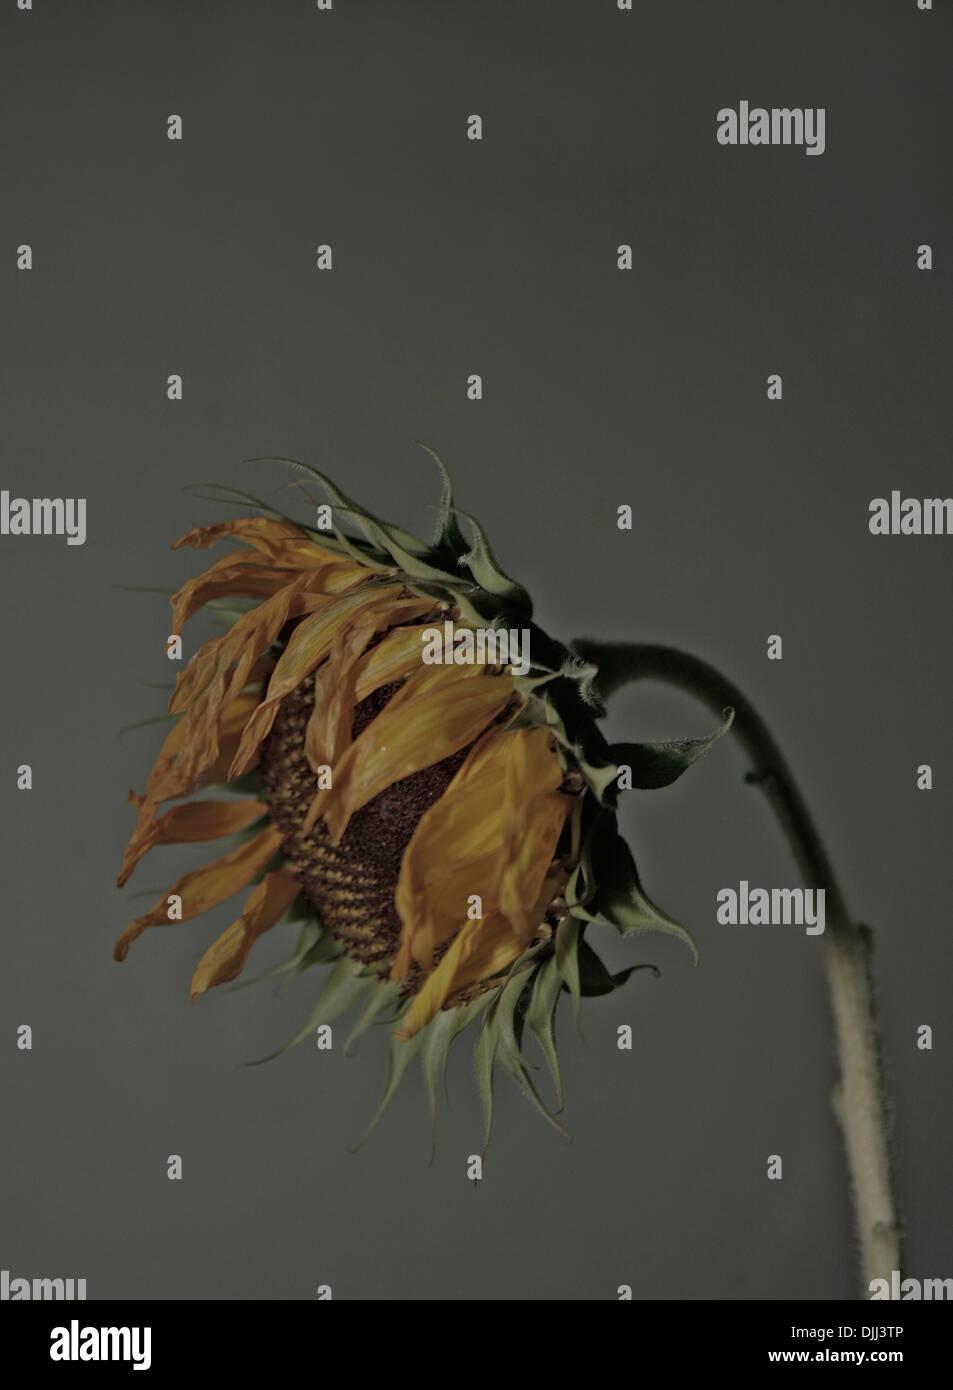 Single dying sunflower. - Stock Image